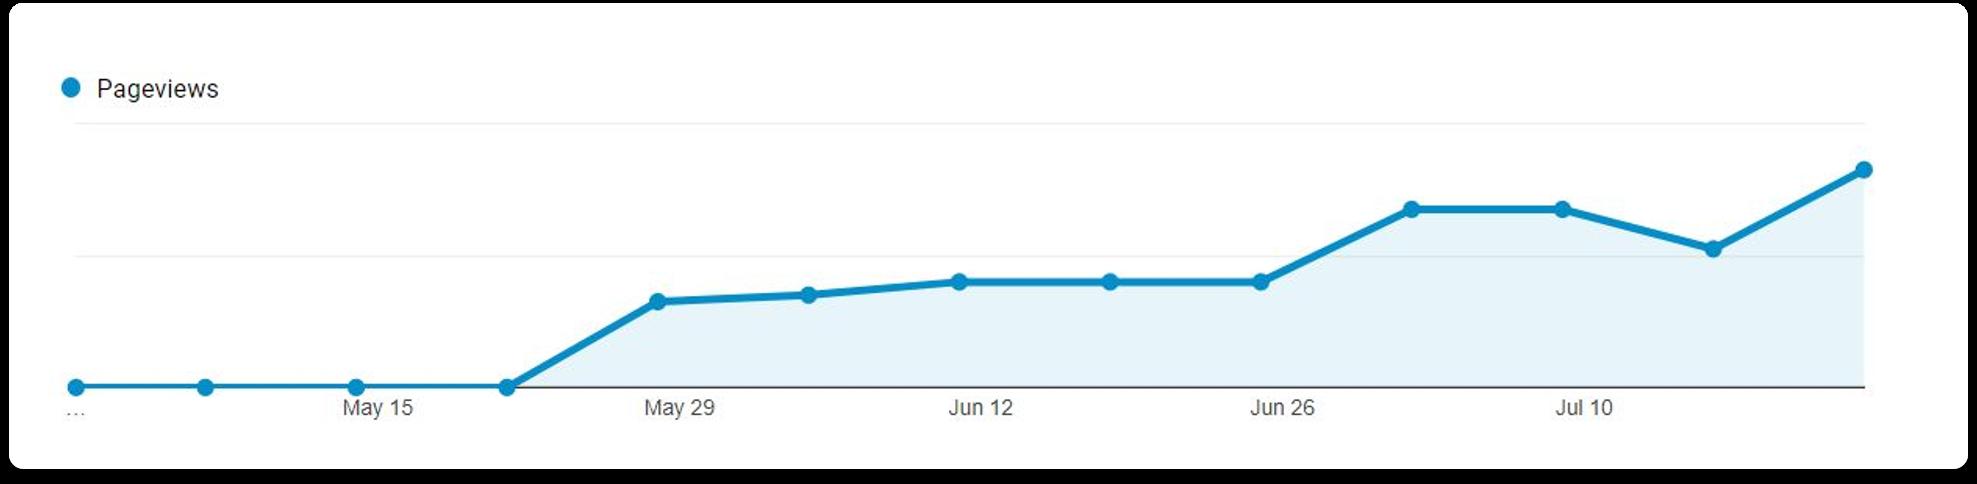 how do backlinks help seo steady pageviews